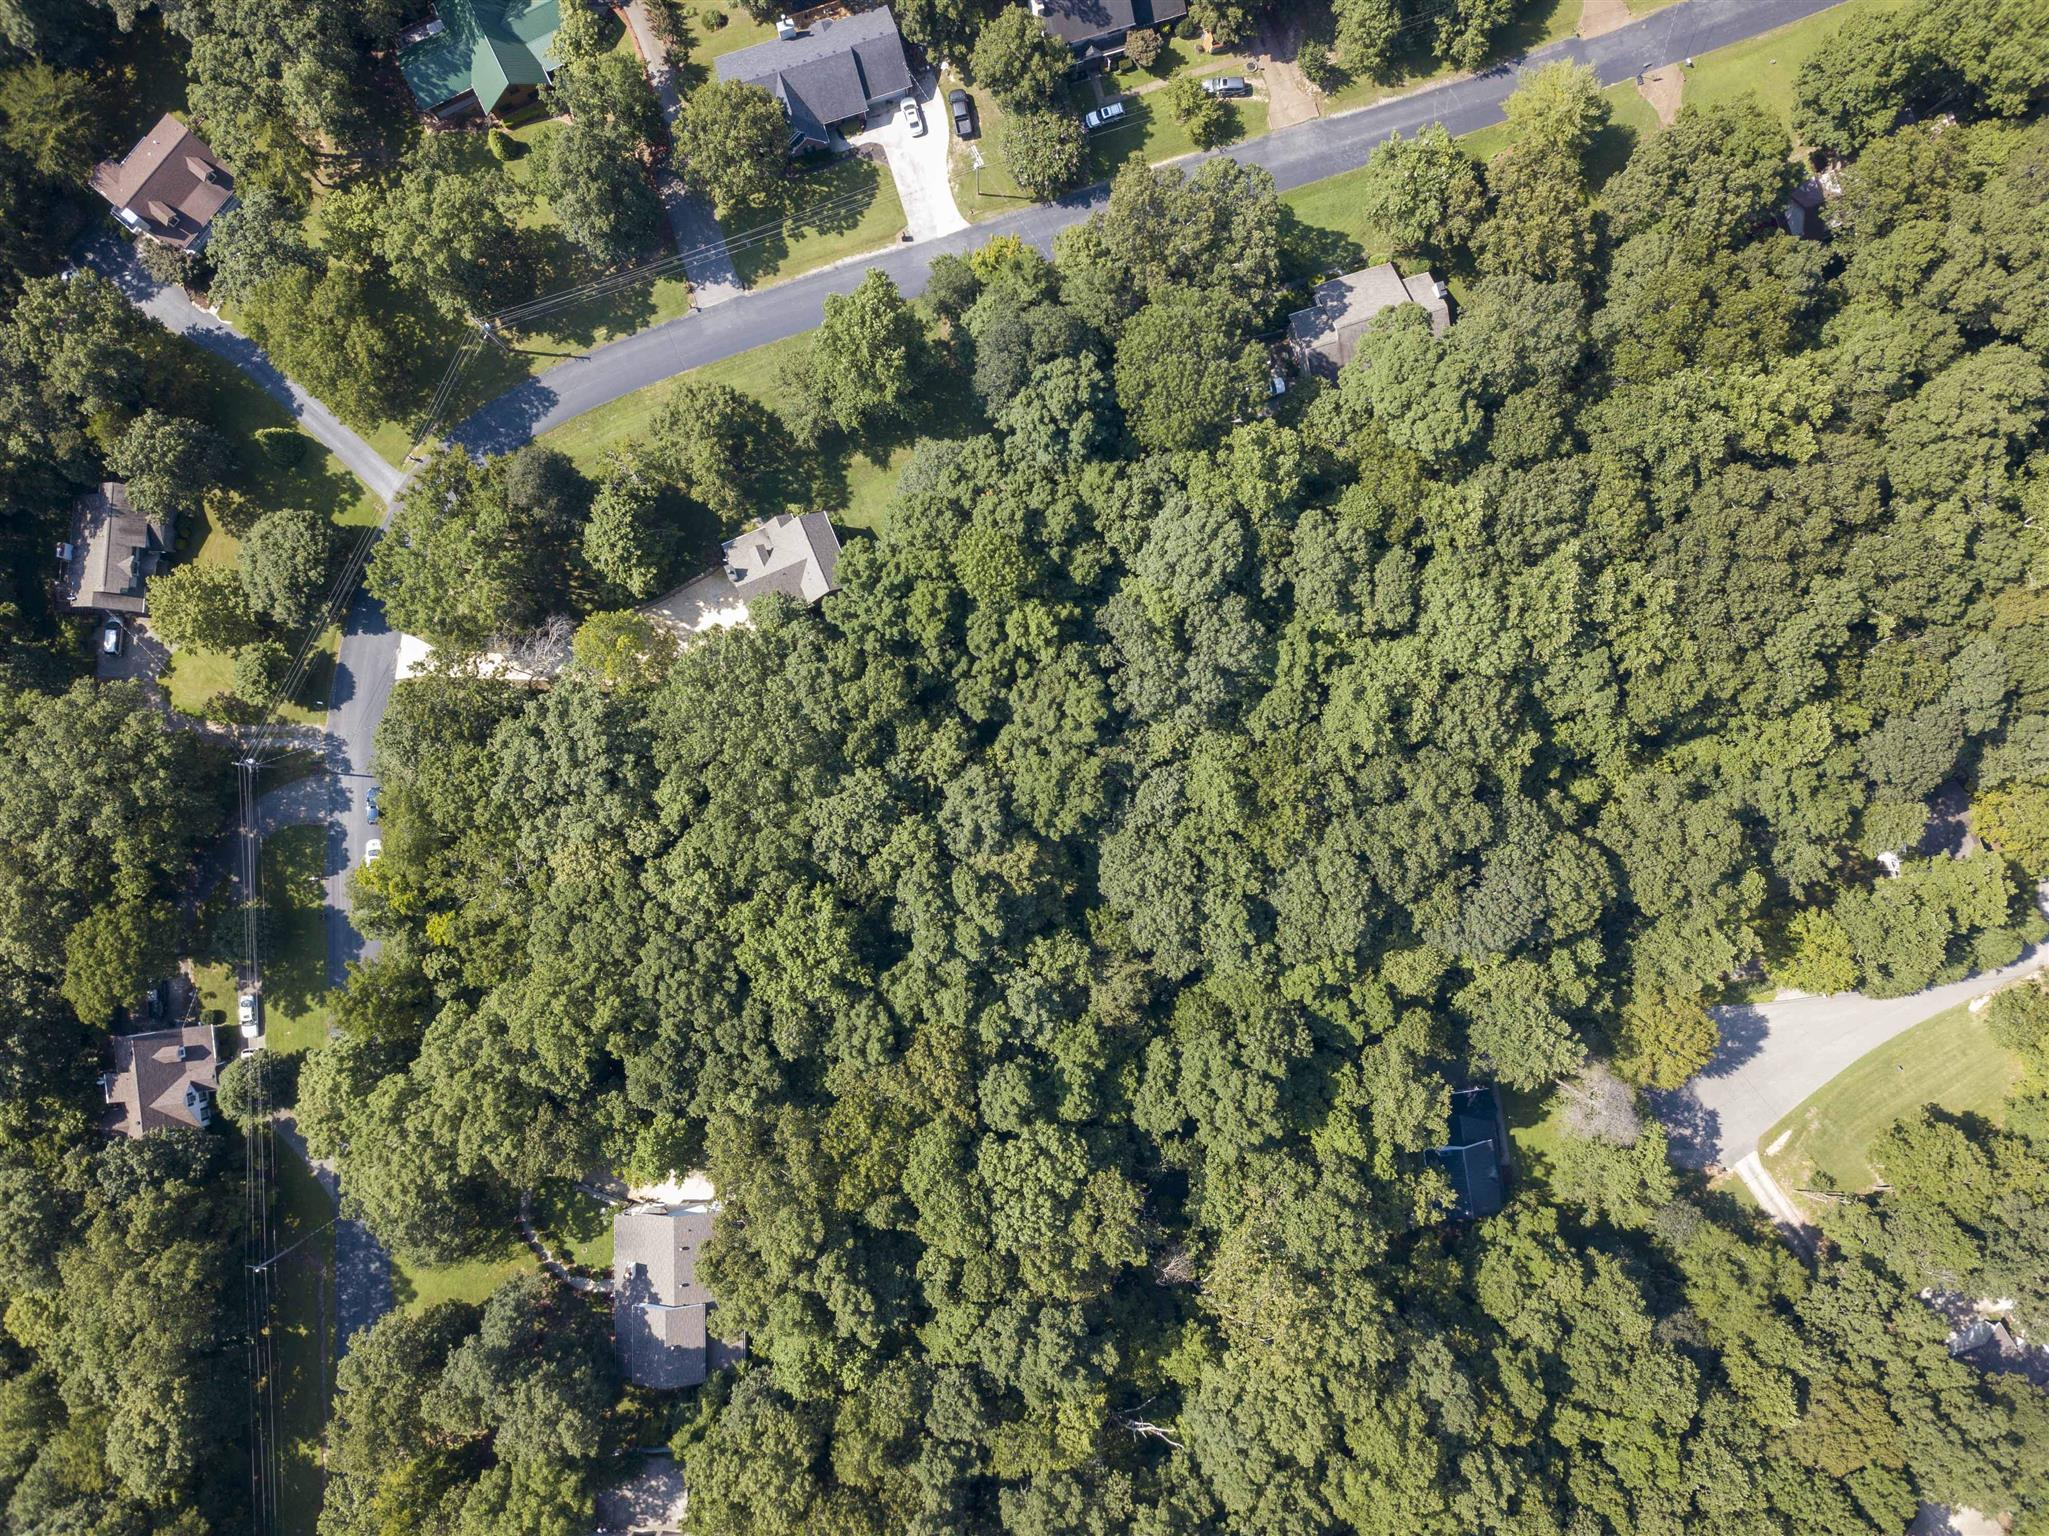 0 Tanglewood Dr, Pegram, TN 37143 - Pegram, TN real estate listing